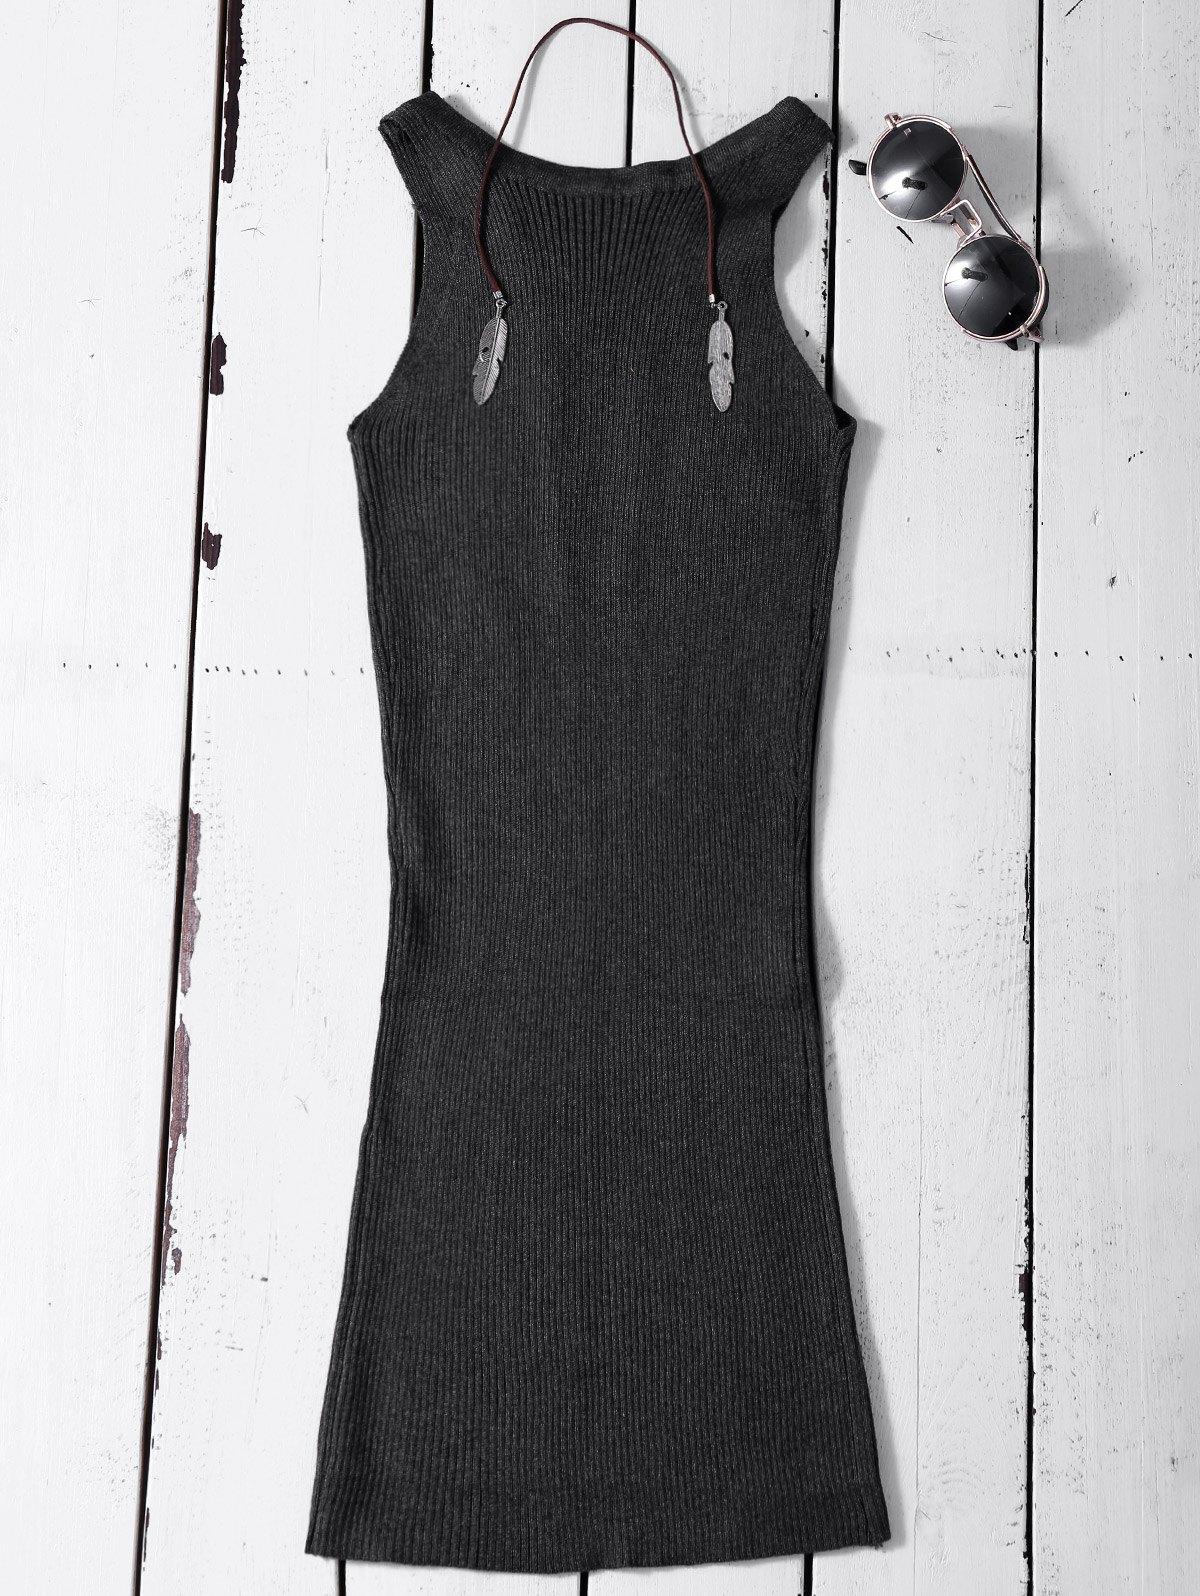 Lace Up Sleeveless Ribbed Knit Dress